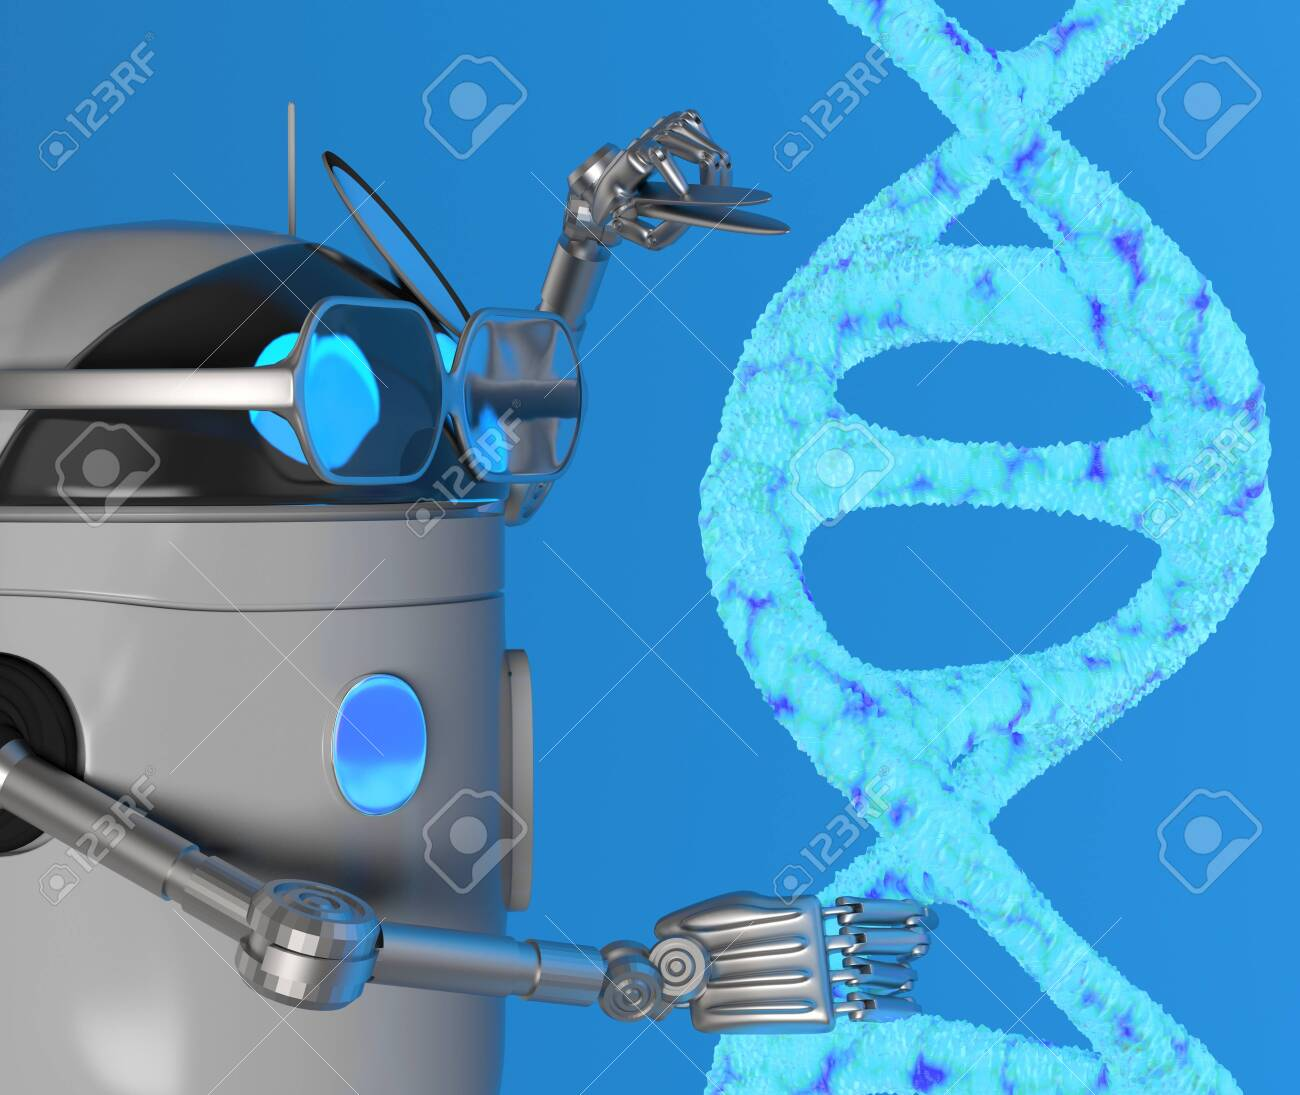 The robot fix Blue Dna molecule,text,3d render. - 131122251